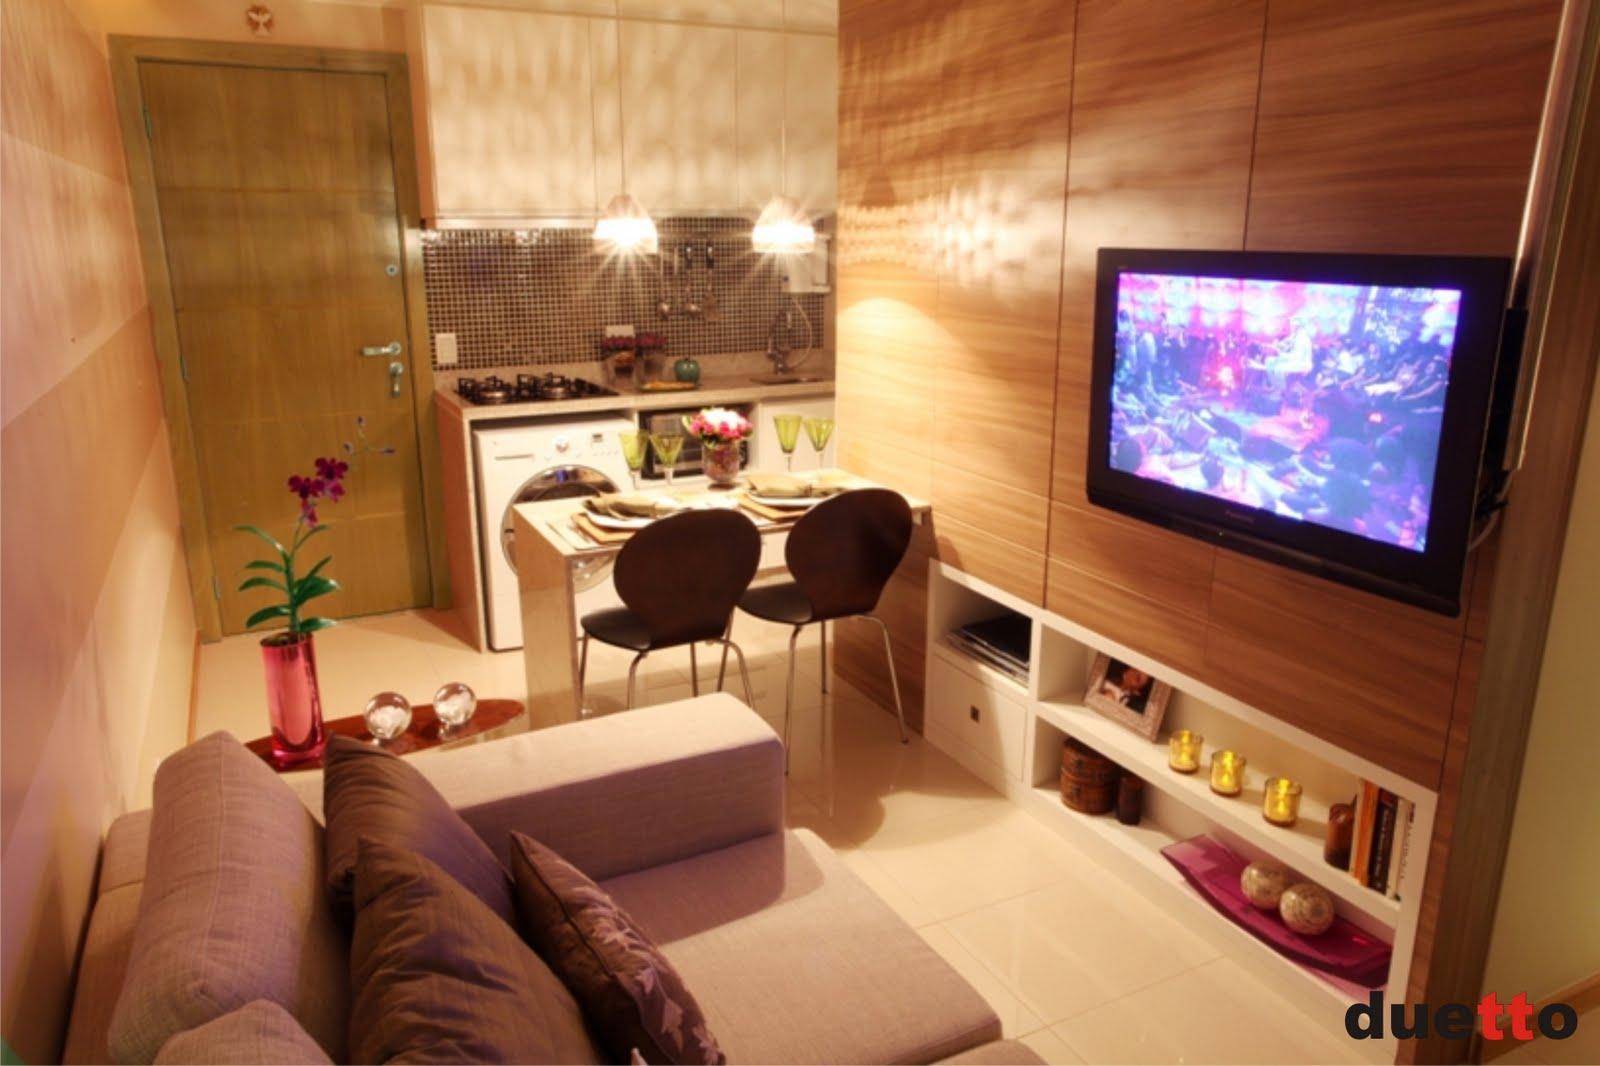 decoracao de interiores gastando pouco:Decoracao De Apartamento Pequeno